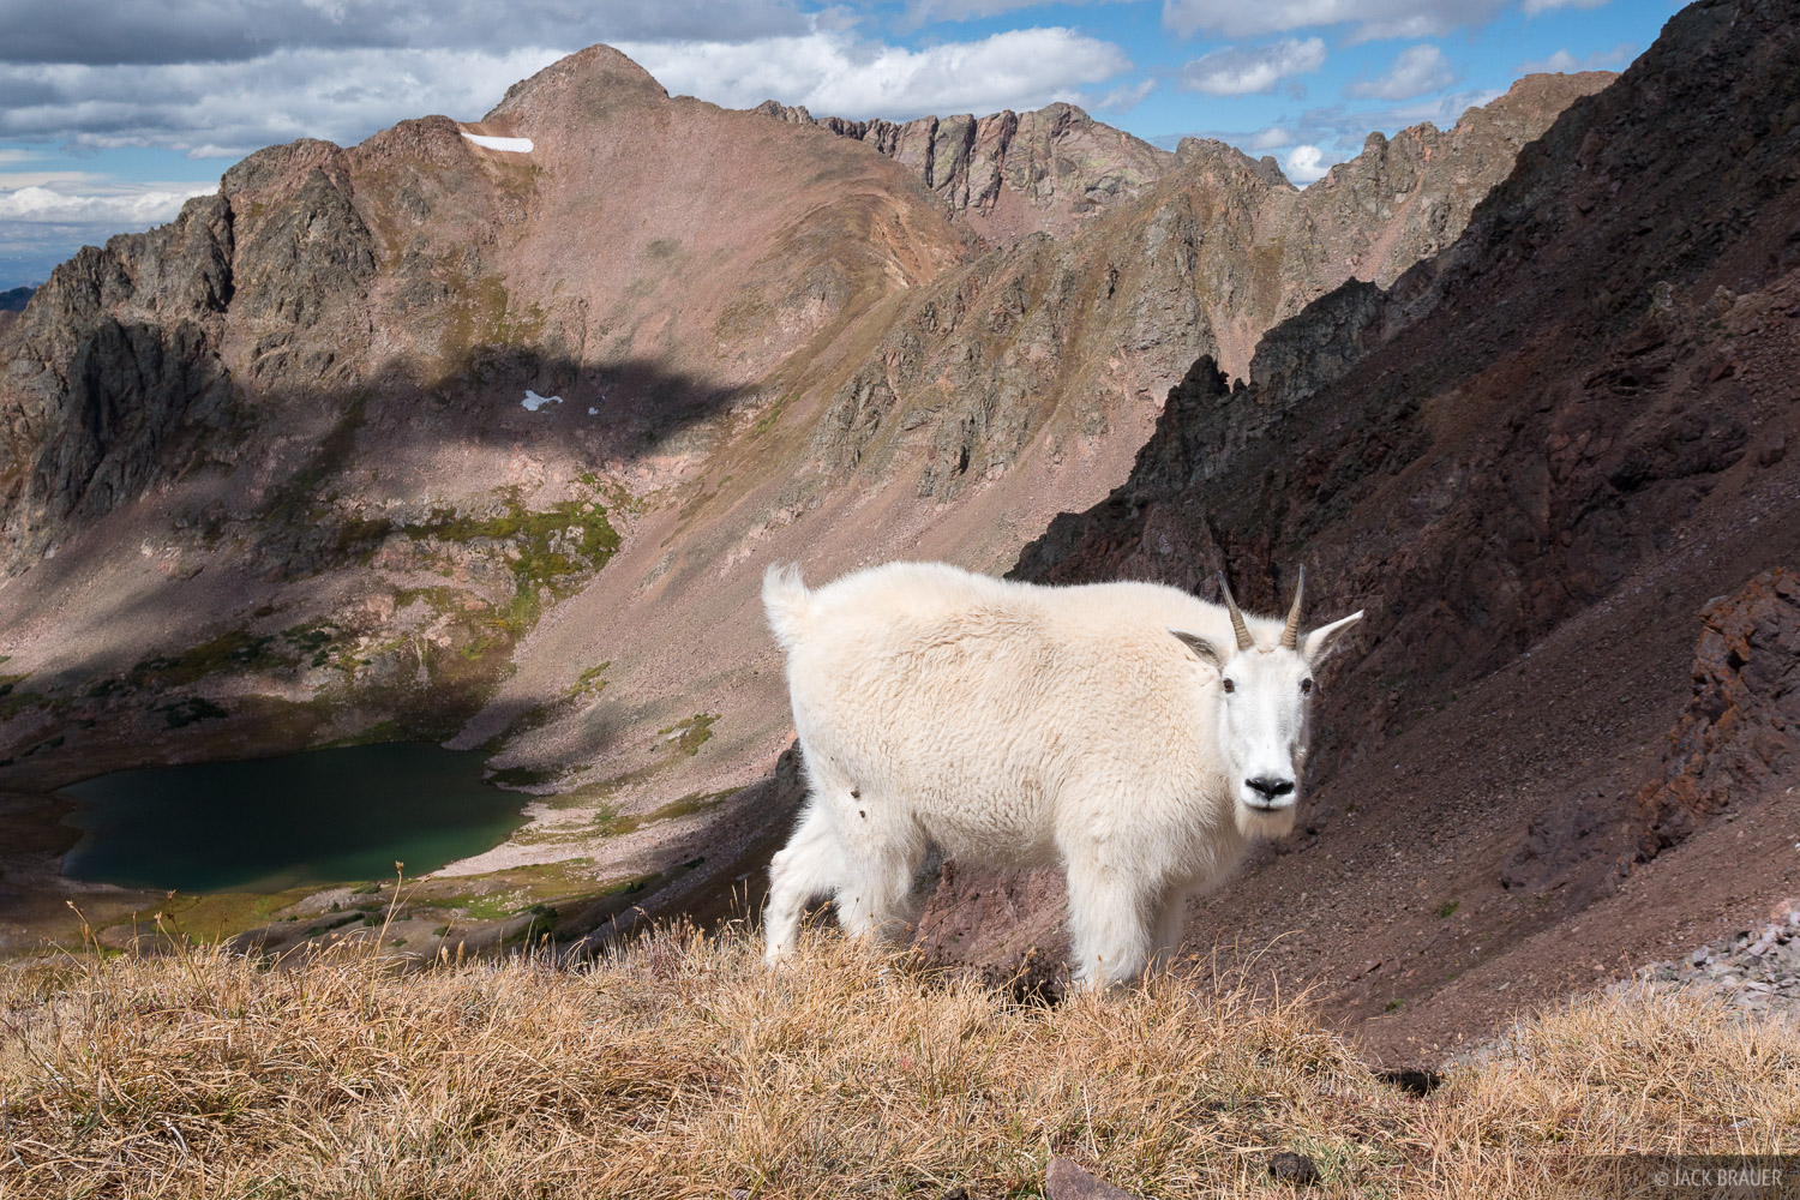 Colorado, Deluge Lake, Gore Range, mountain goat, Eagles Nest Wilderness, photo